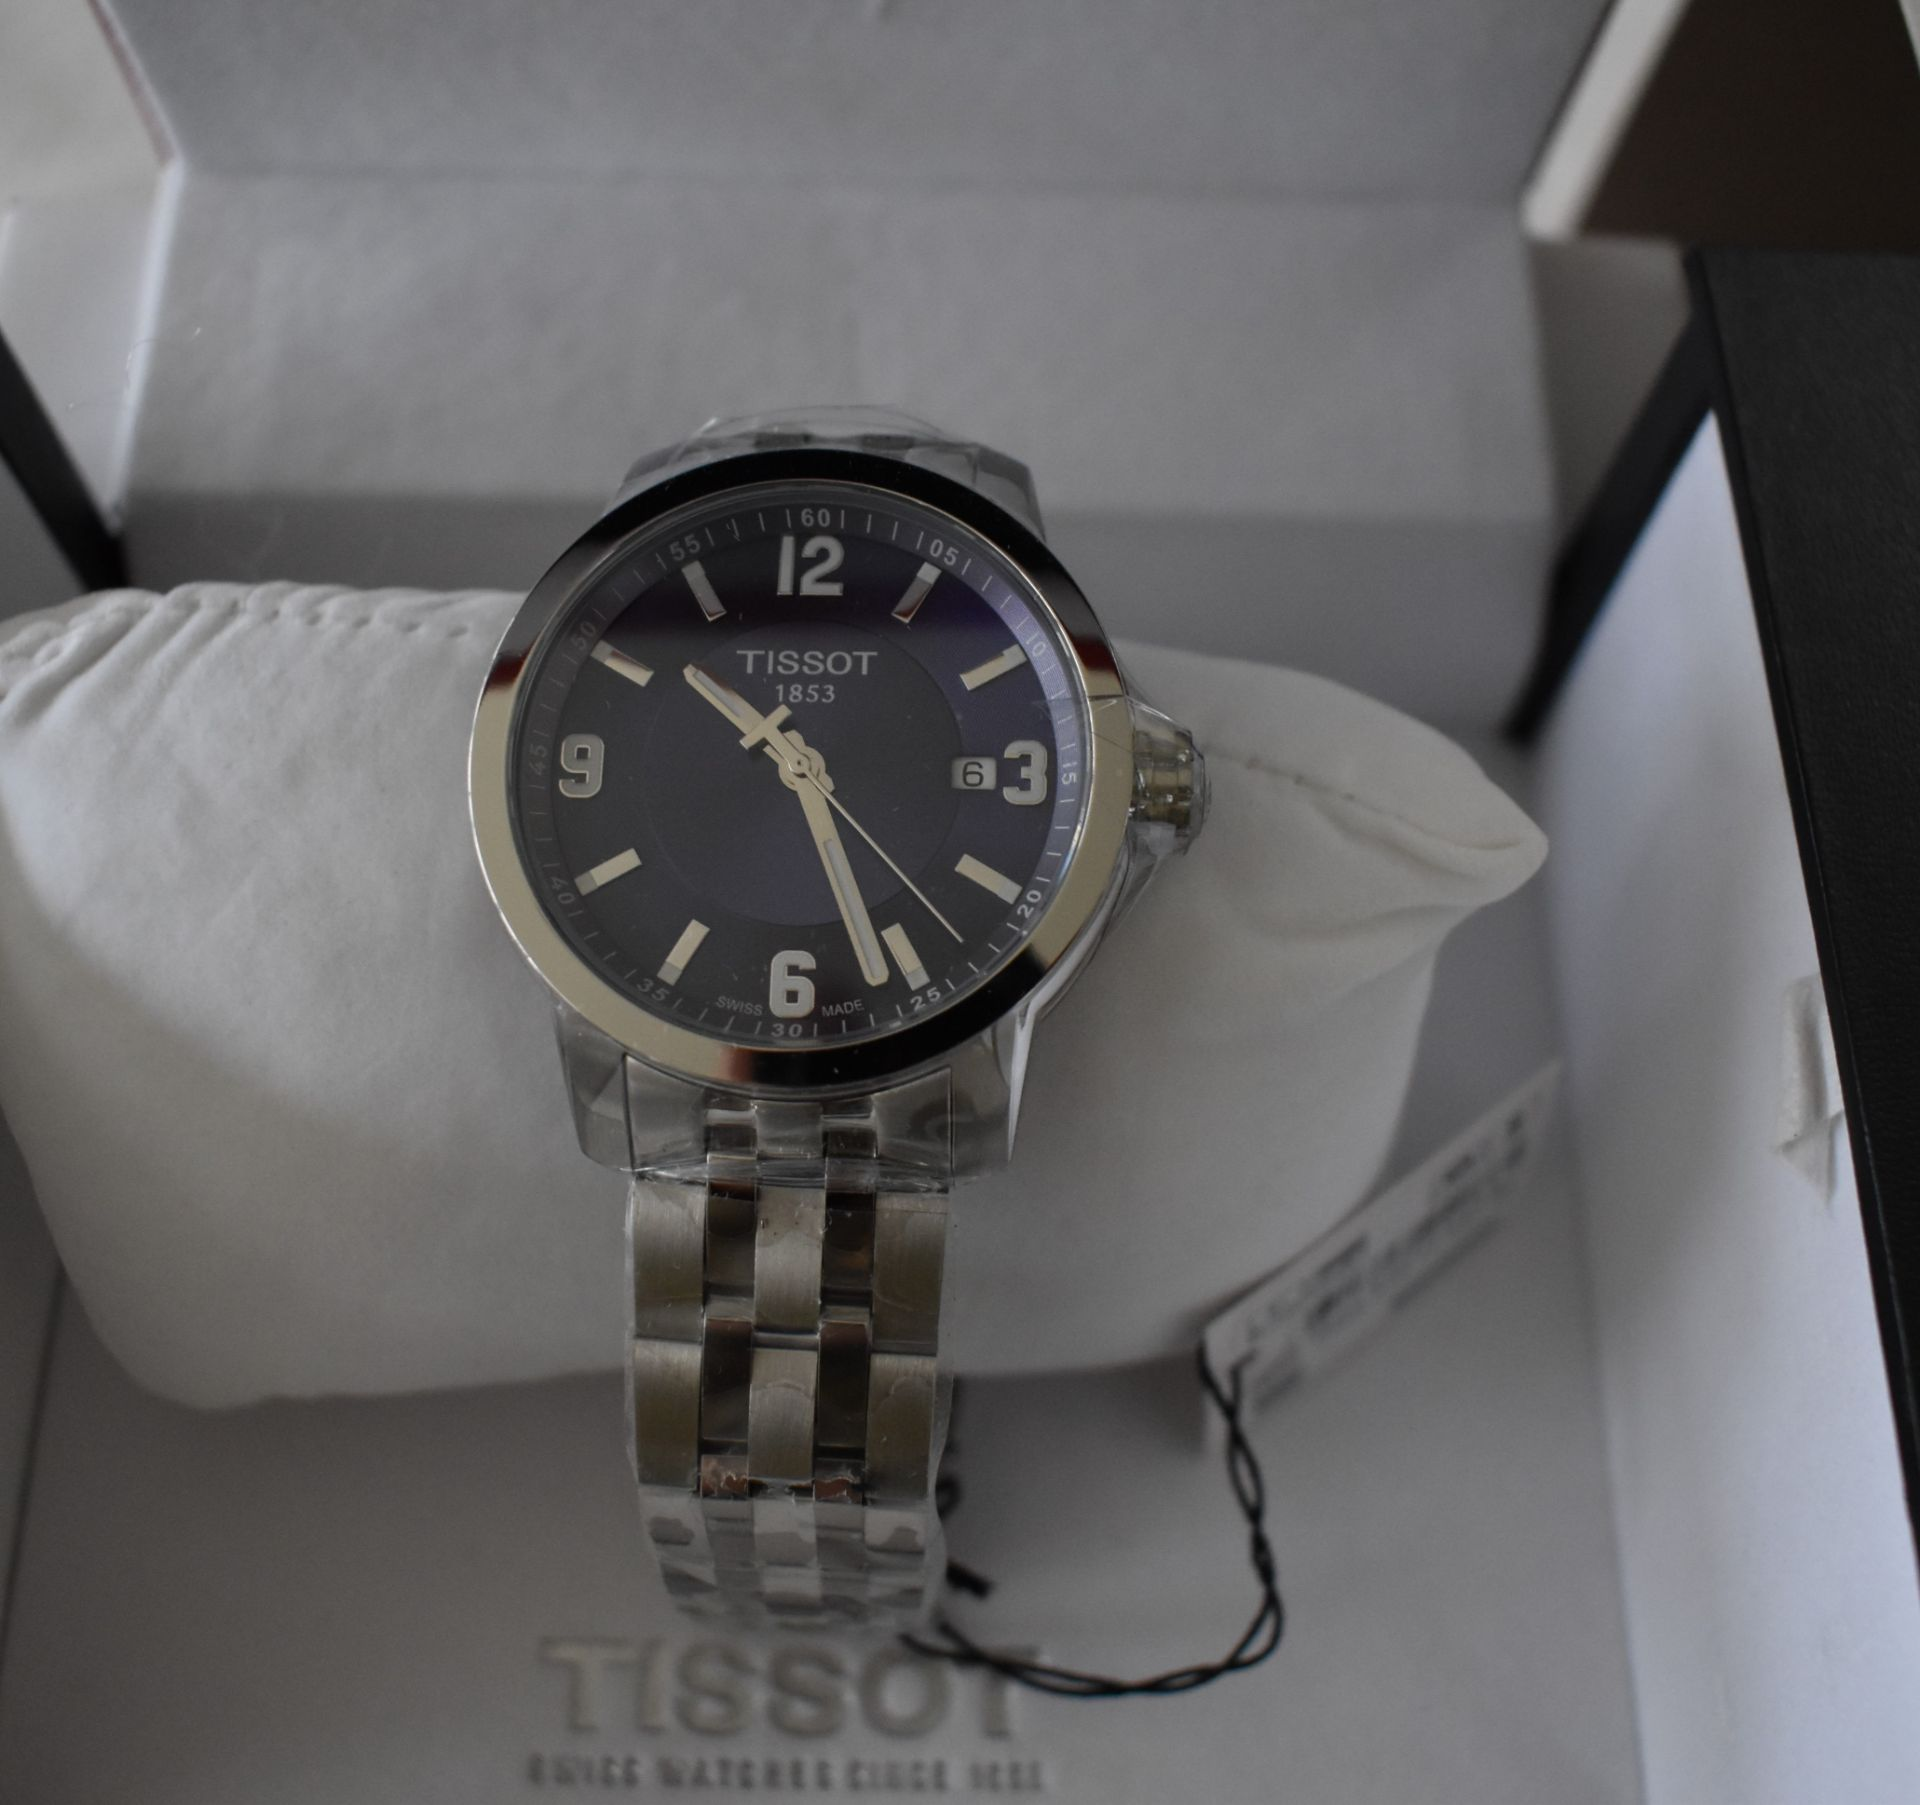 Tissot Men's Watch TO55.410.11.047.00 - Image 3 of 3